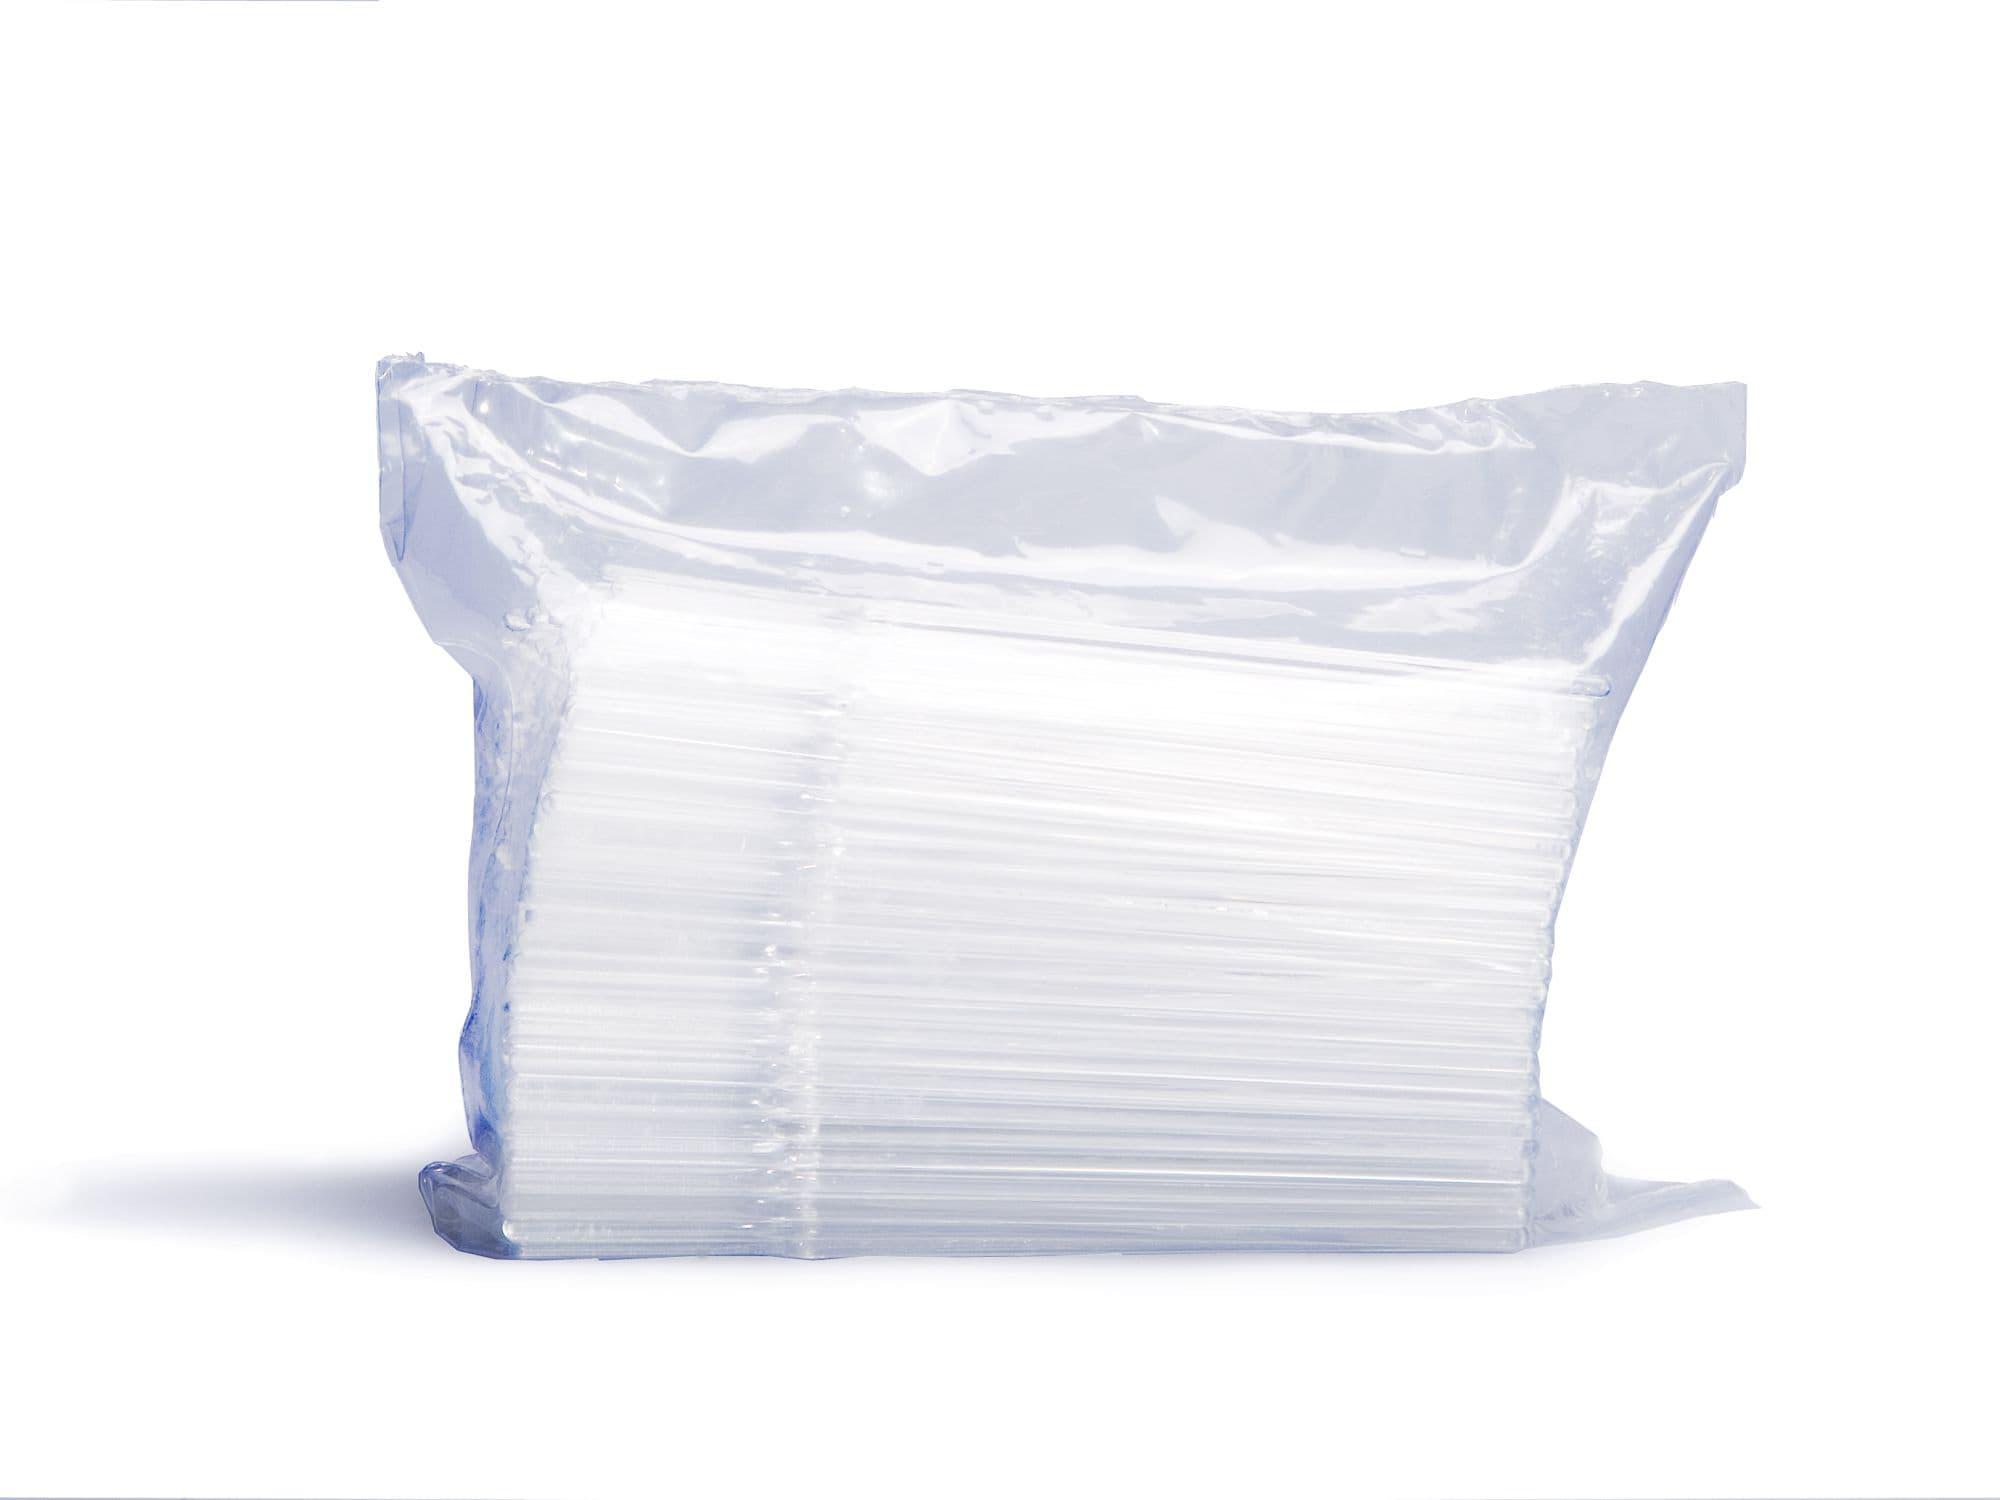 stirrers per bag of 500 pieces